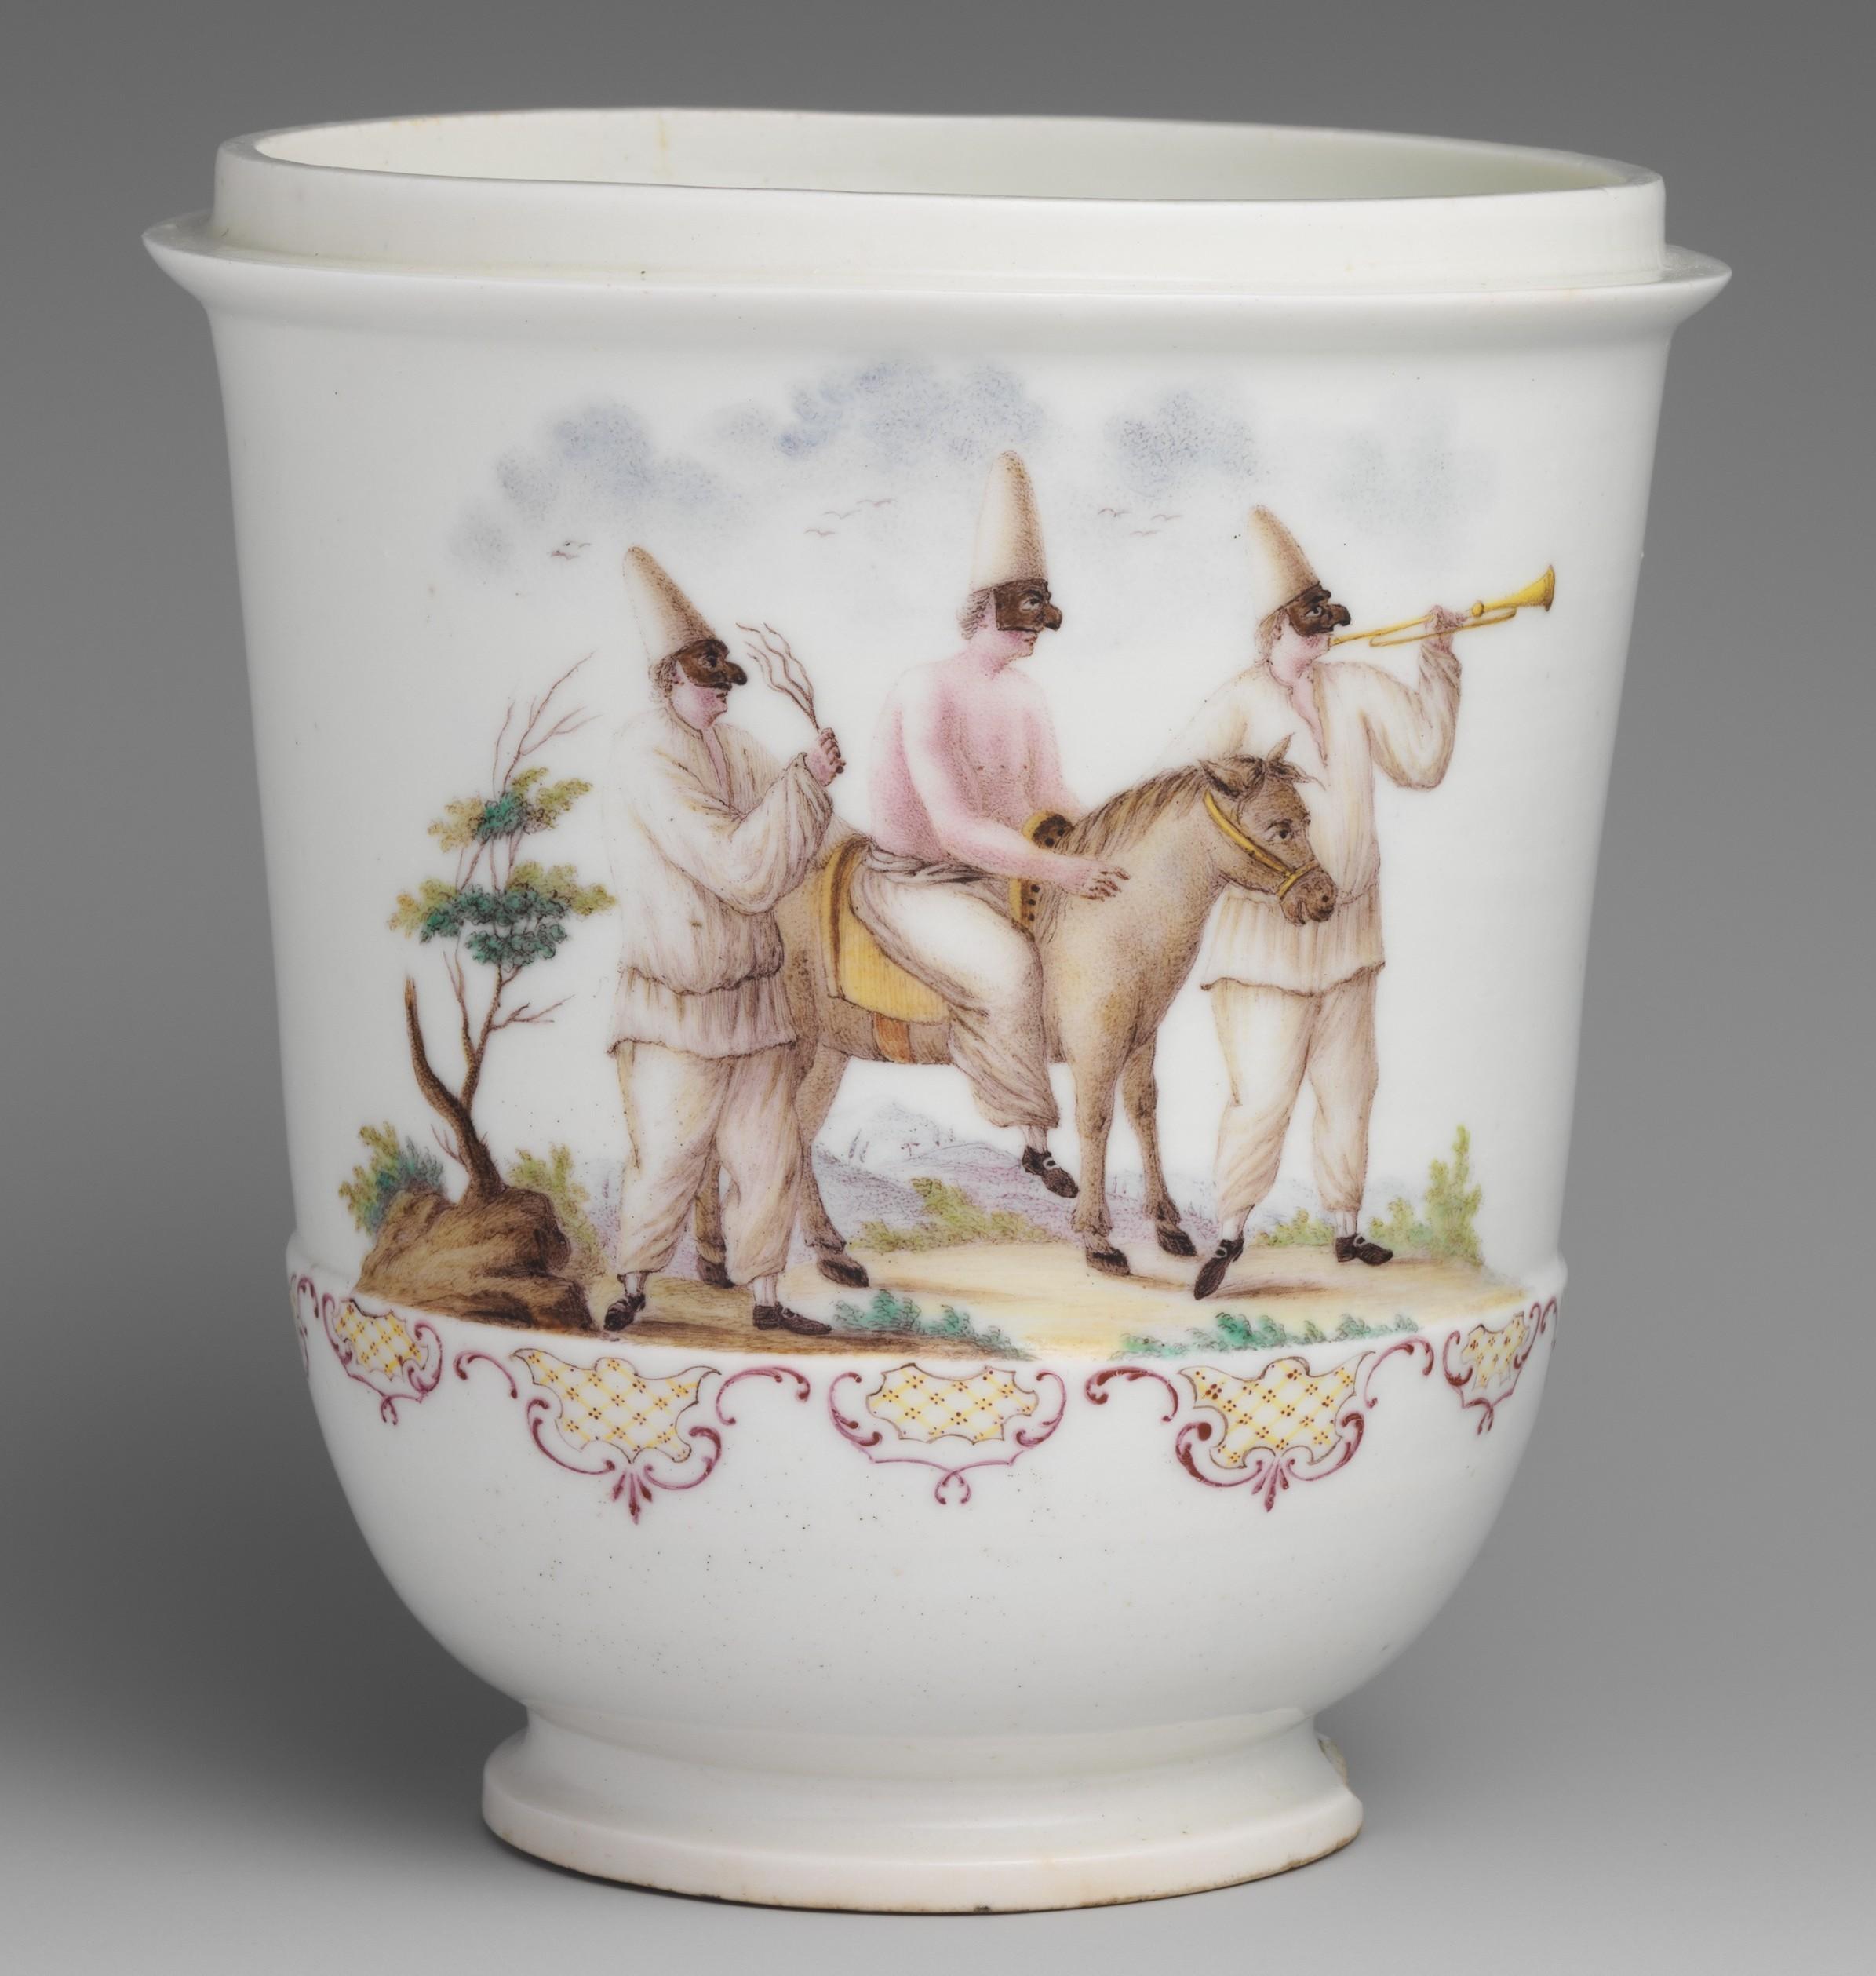 Google Craftsman 17.5 Carbra Capodimonte Porcelain Of Google Craftsman 17.5 Carbra